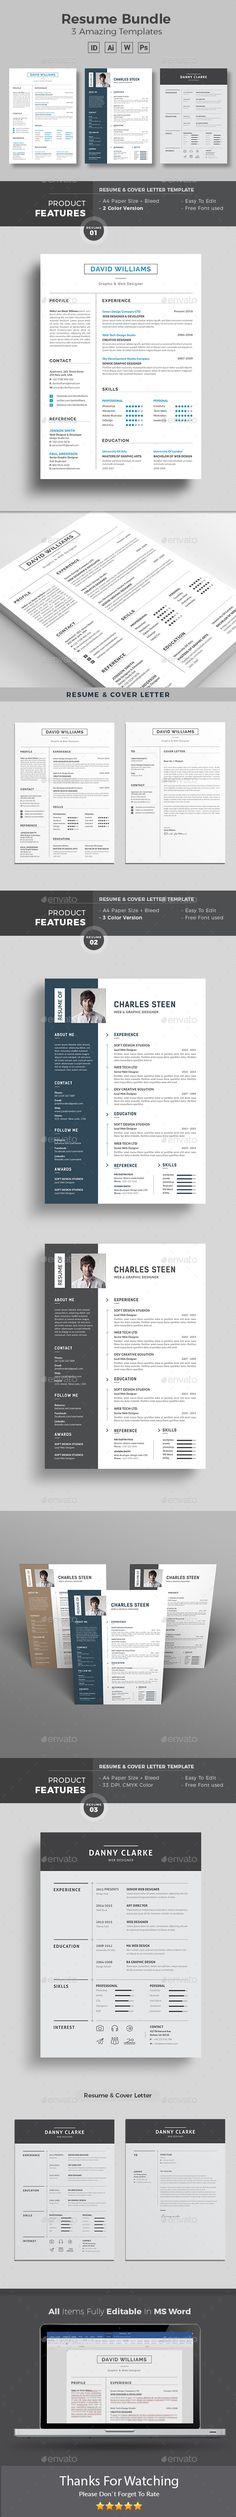 #Resume #Word Bundle - Resumes #Stationery